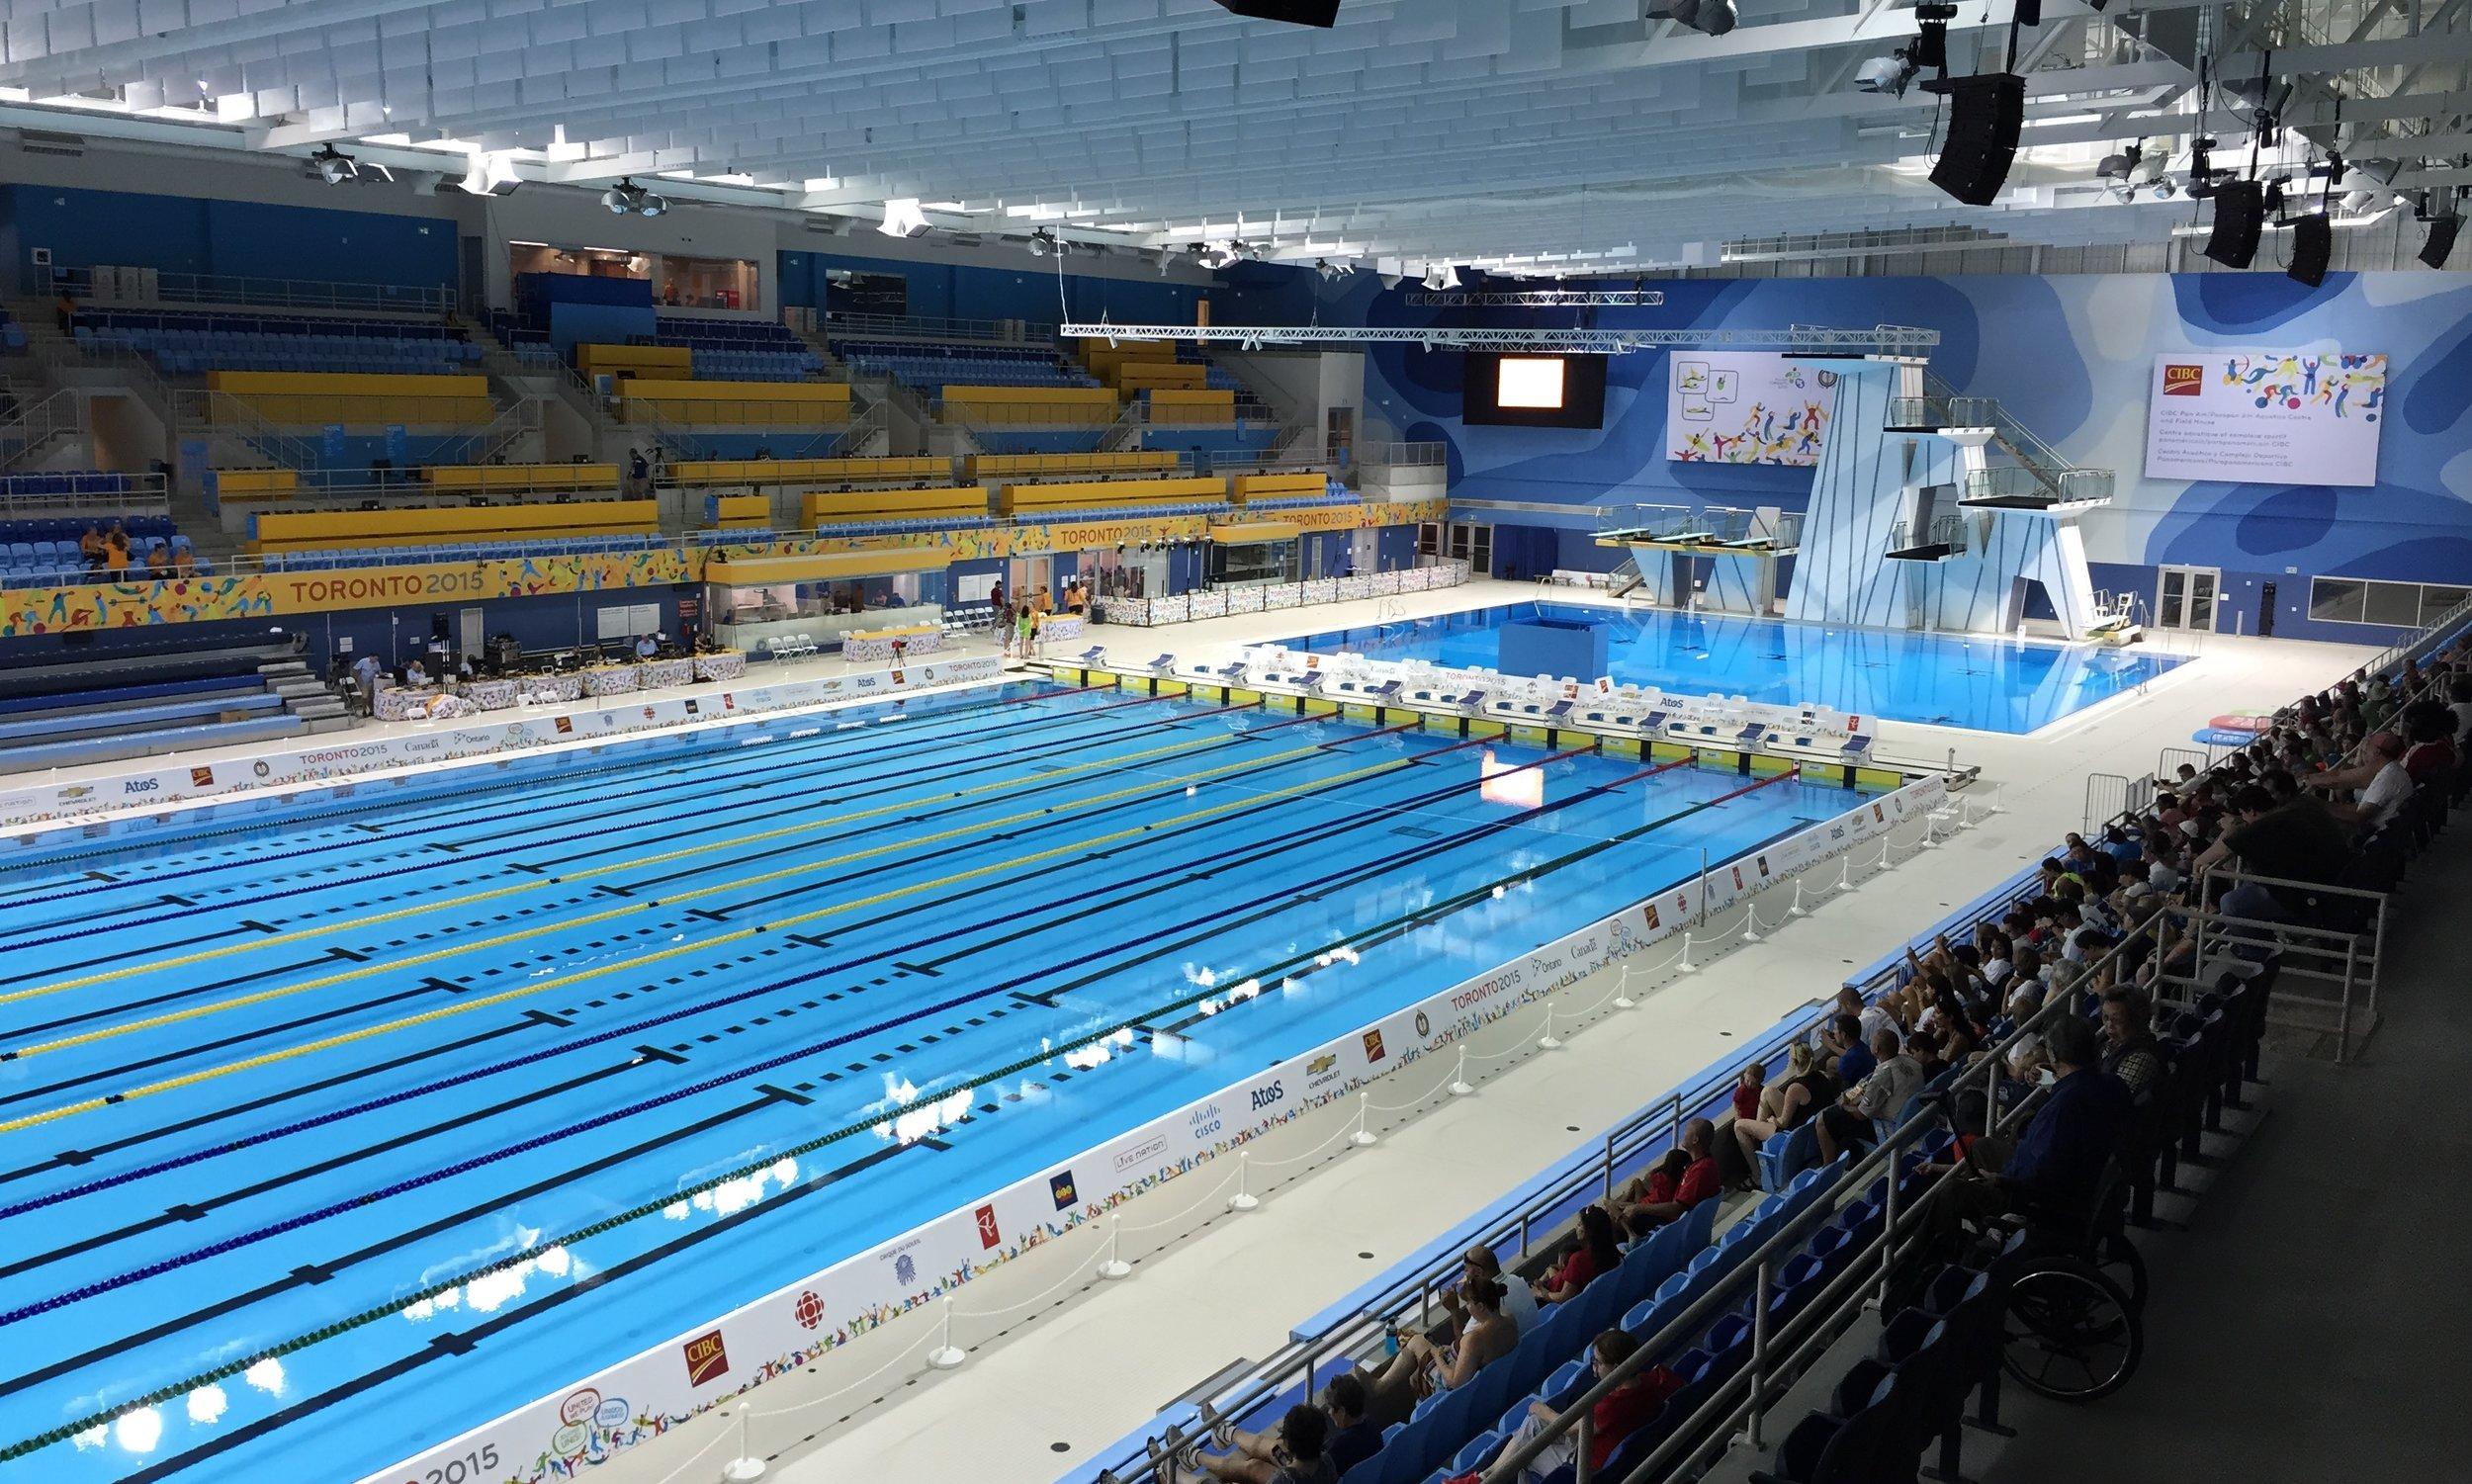 Toronto_Pan_Am_Sports_Centre_Main_Pool_Pan_Am_Games.jpg